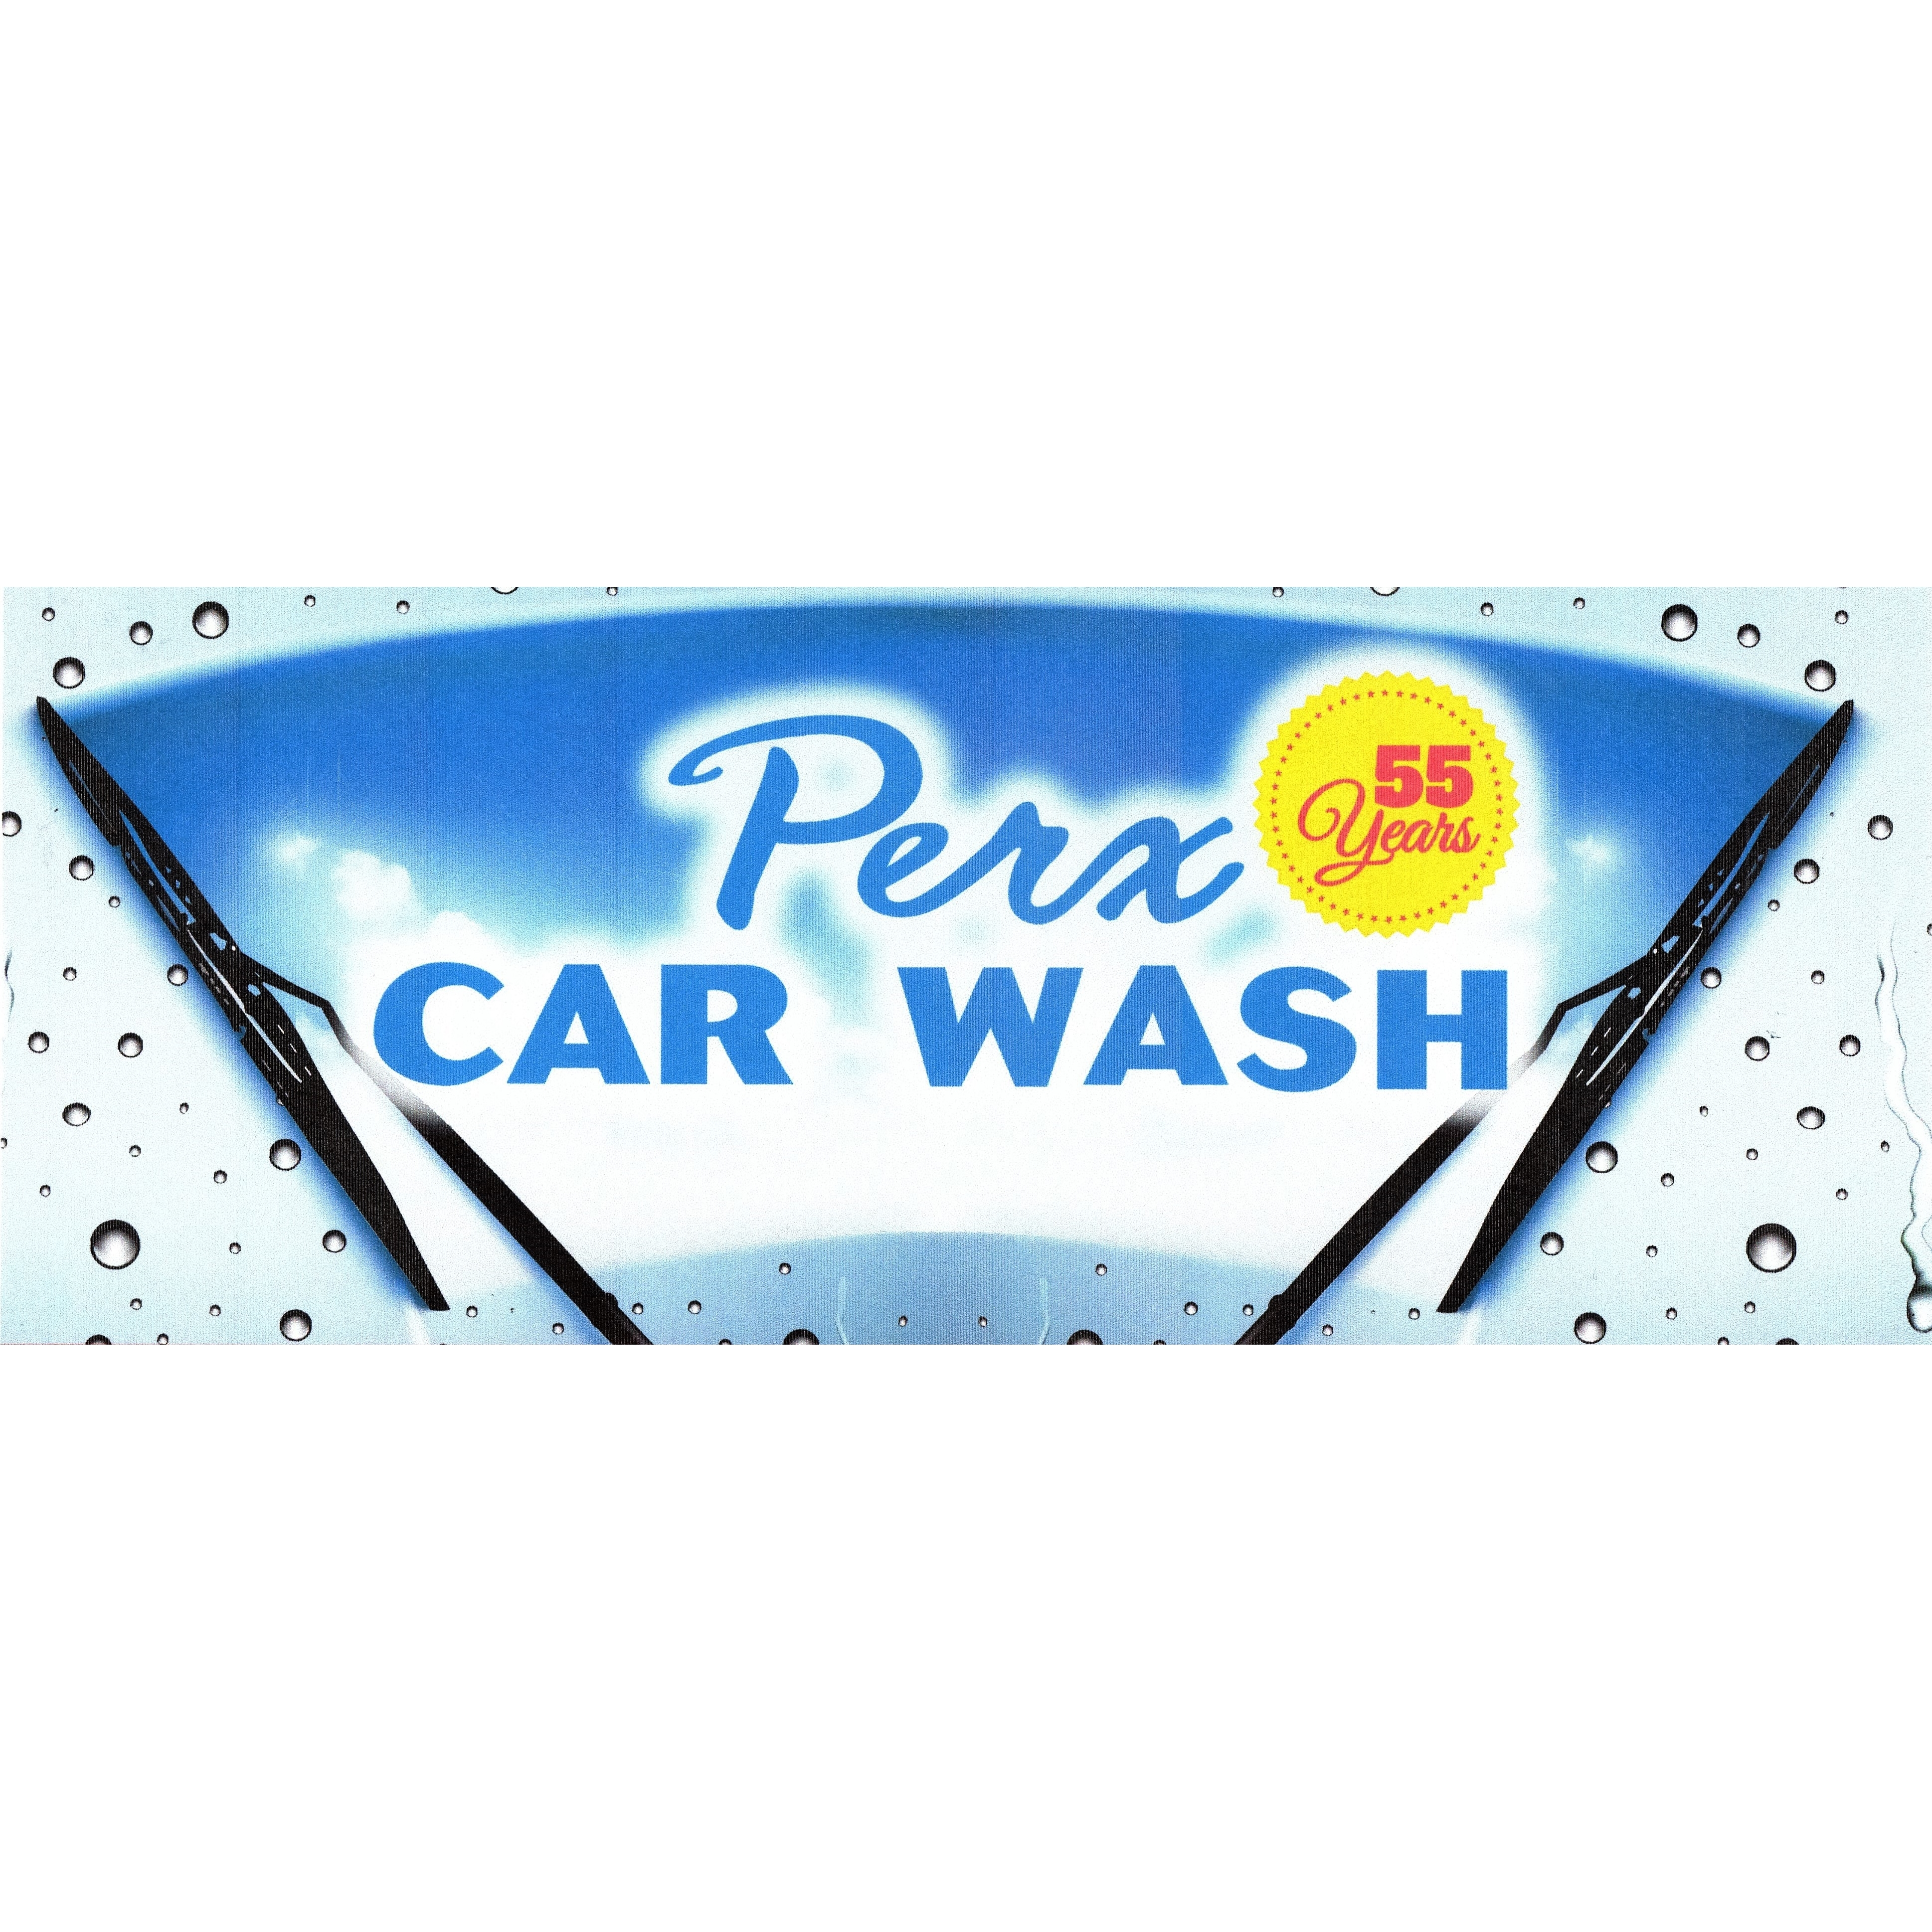 Perx Car Wash